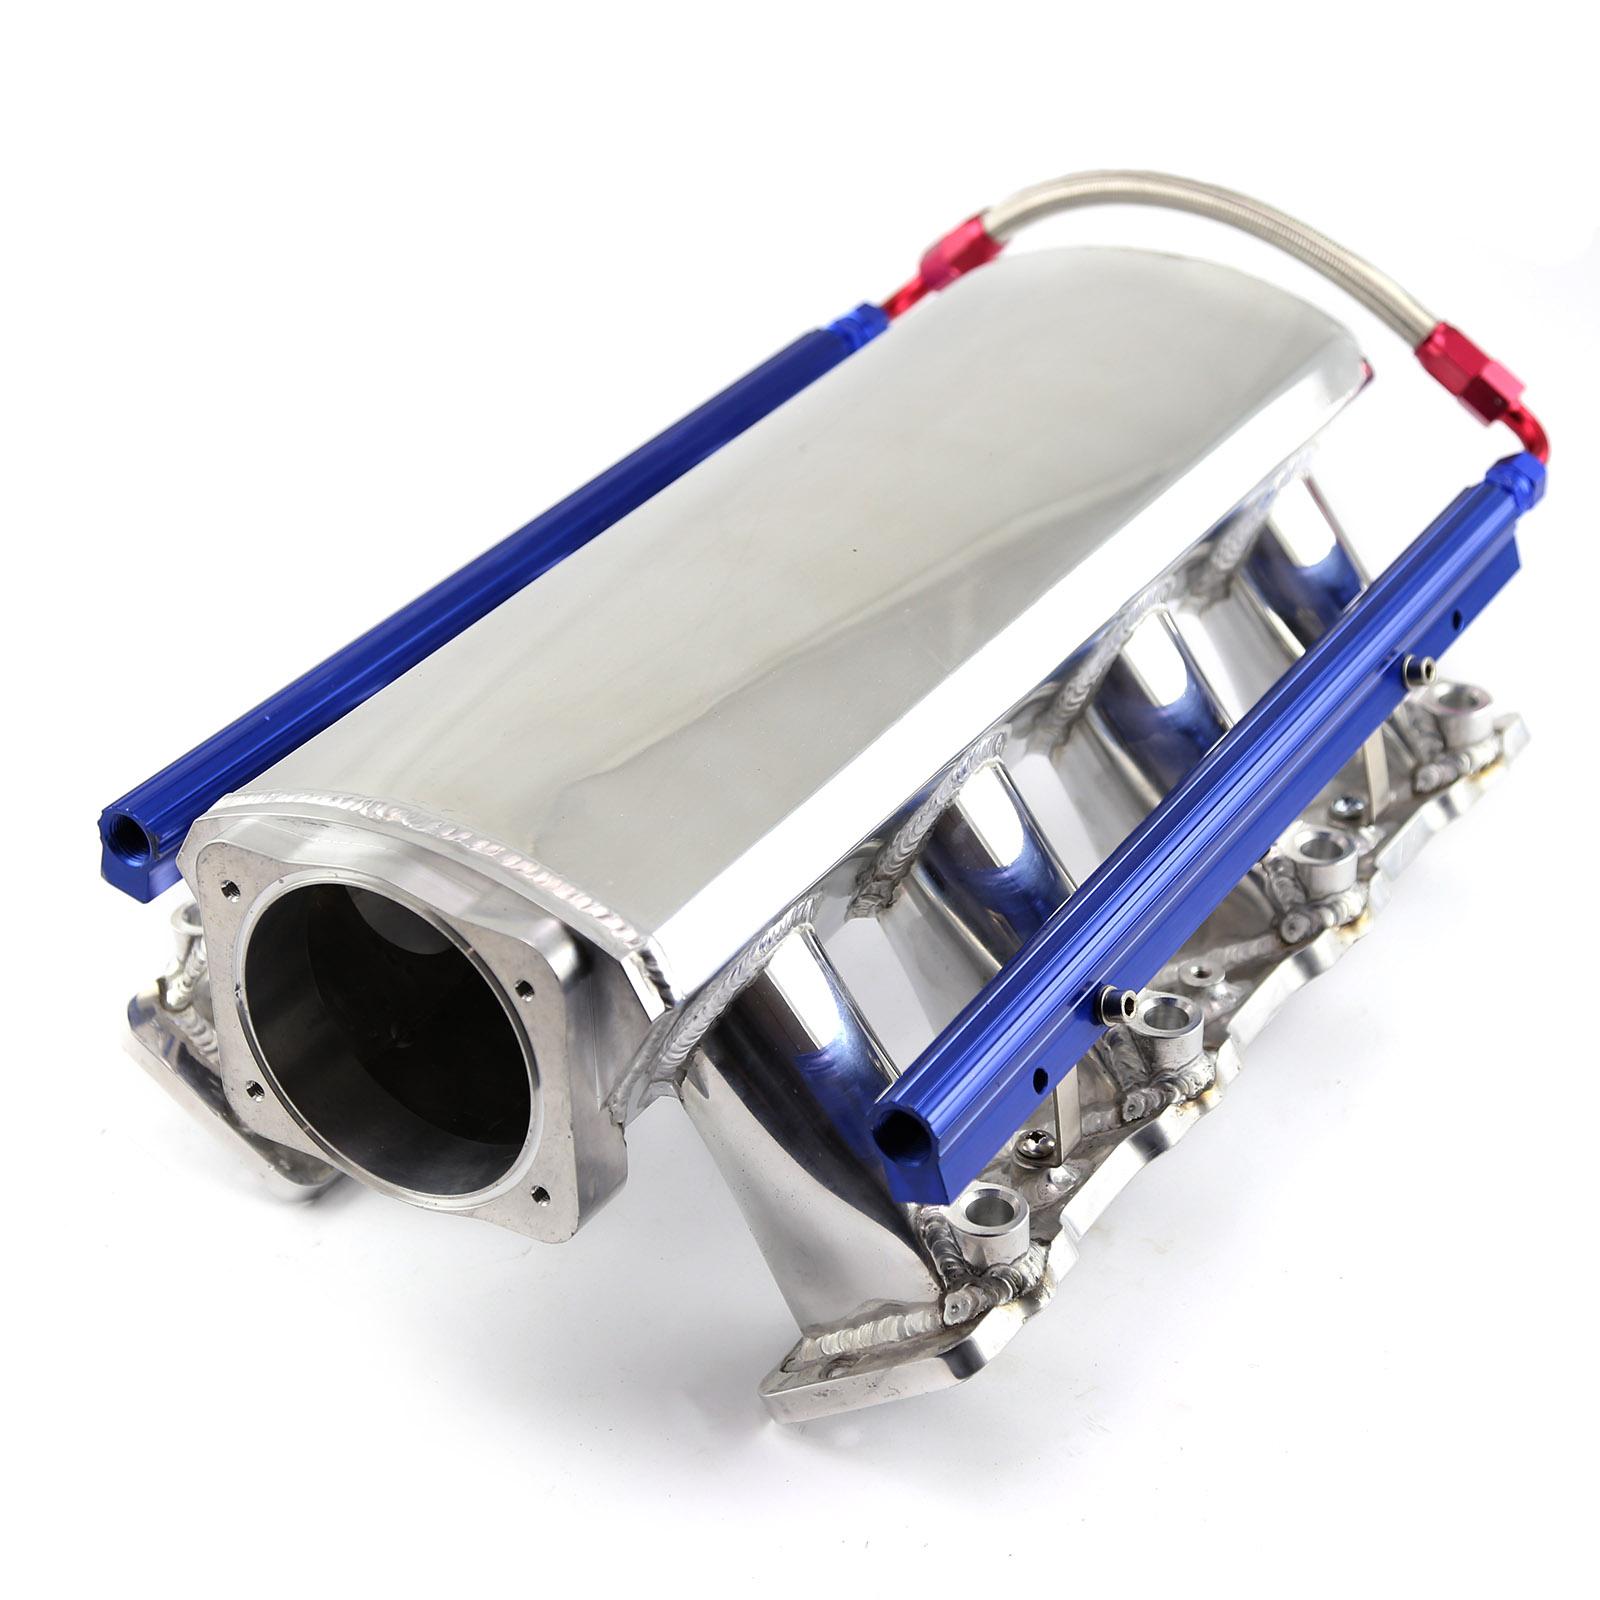 Chevy LS7 Fabricated Aluminum Ram Air EFI Intake Manifold